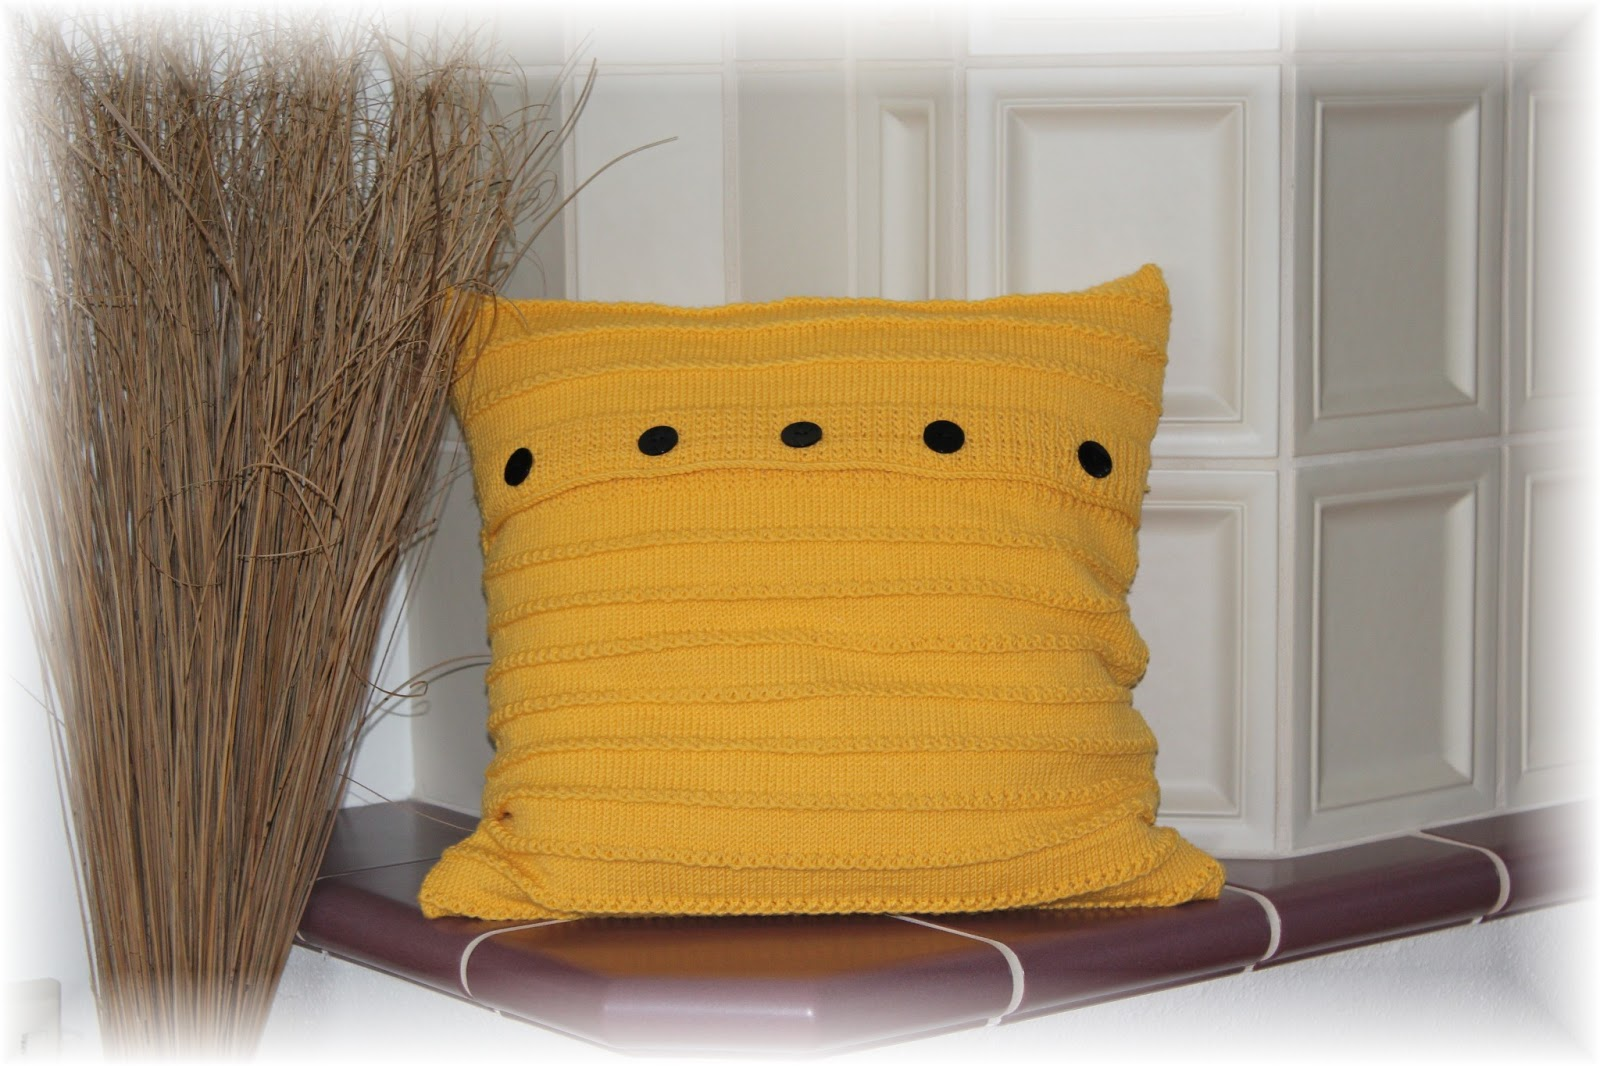 vielerlei selbstgemachtes couch kissen 1. Black Bedroom Furniture Sets. Home Design Ideas